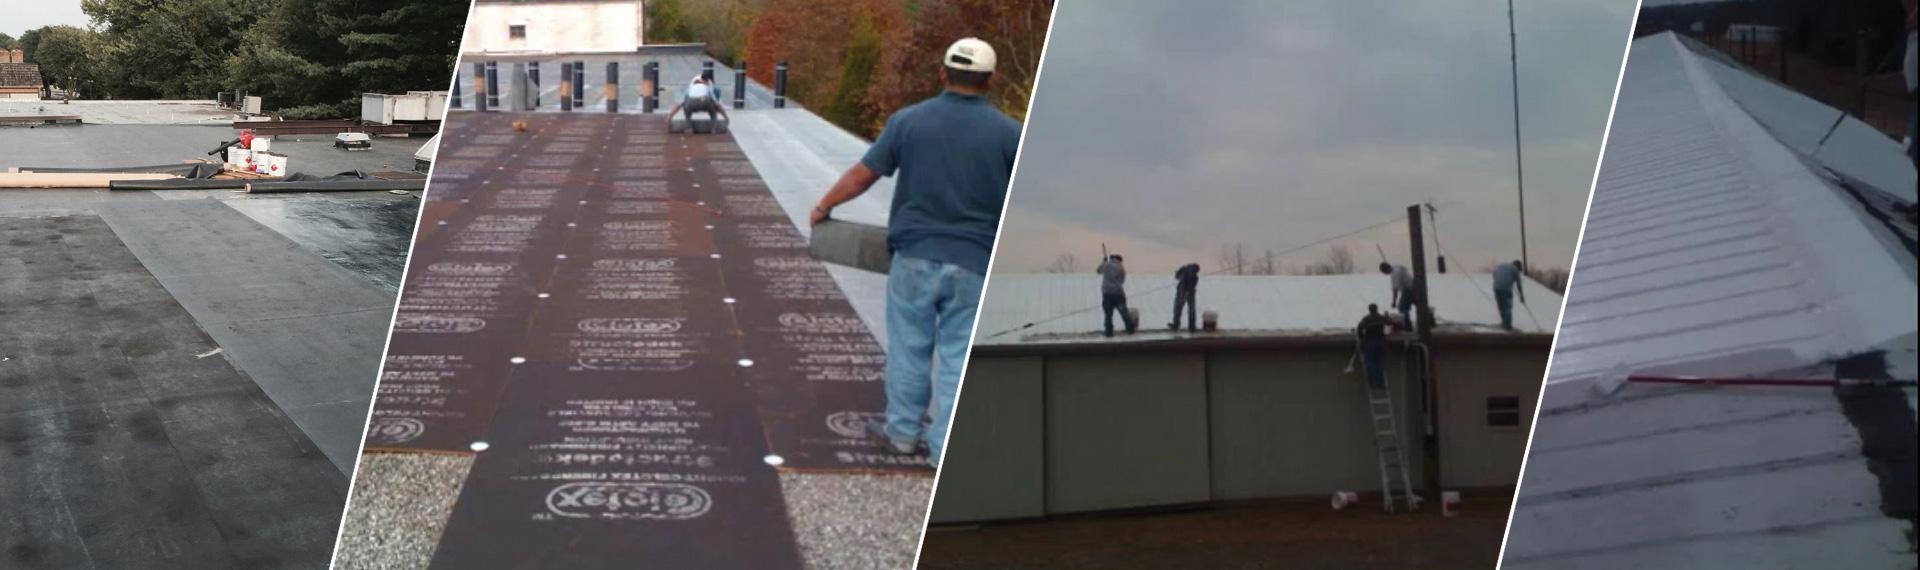 Professional Roofing Hyattsville MD